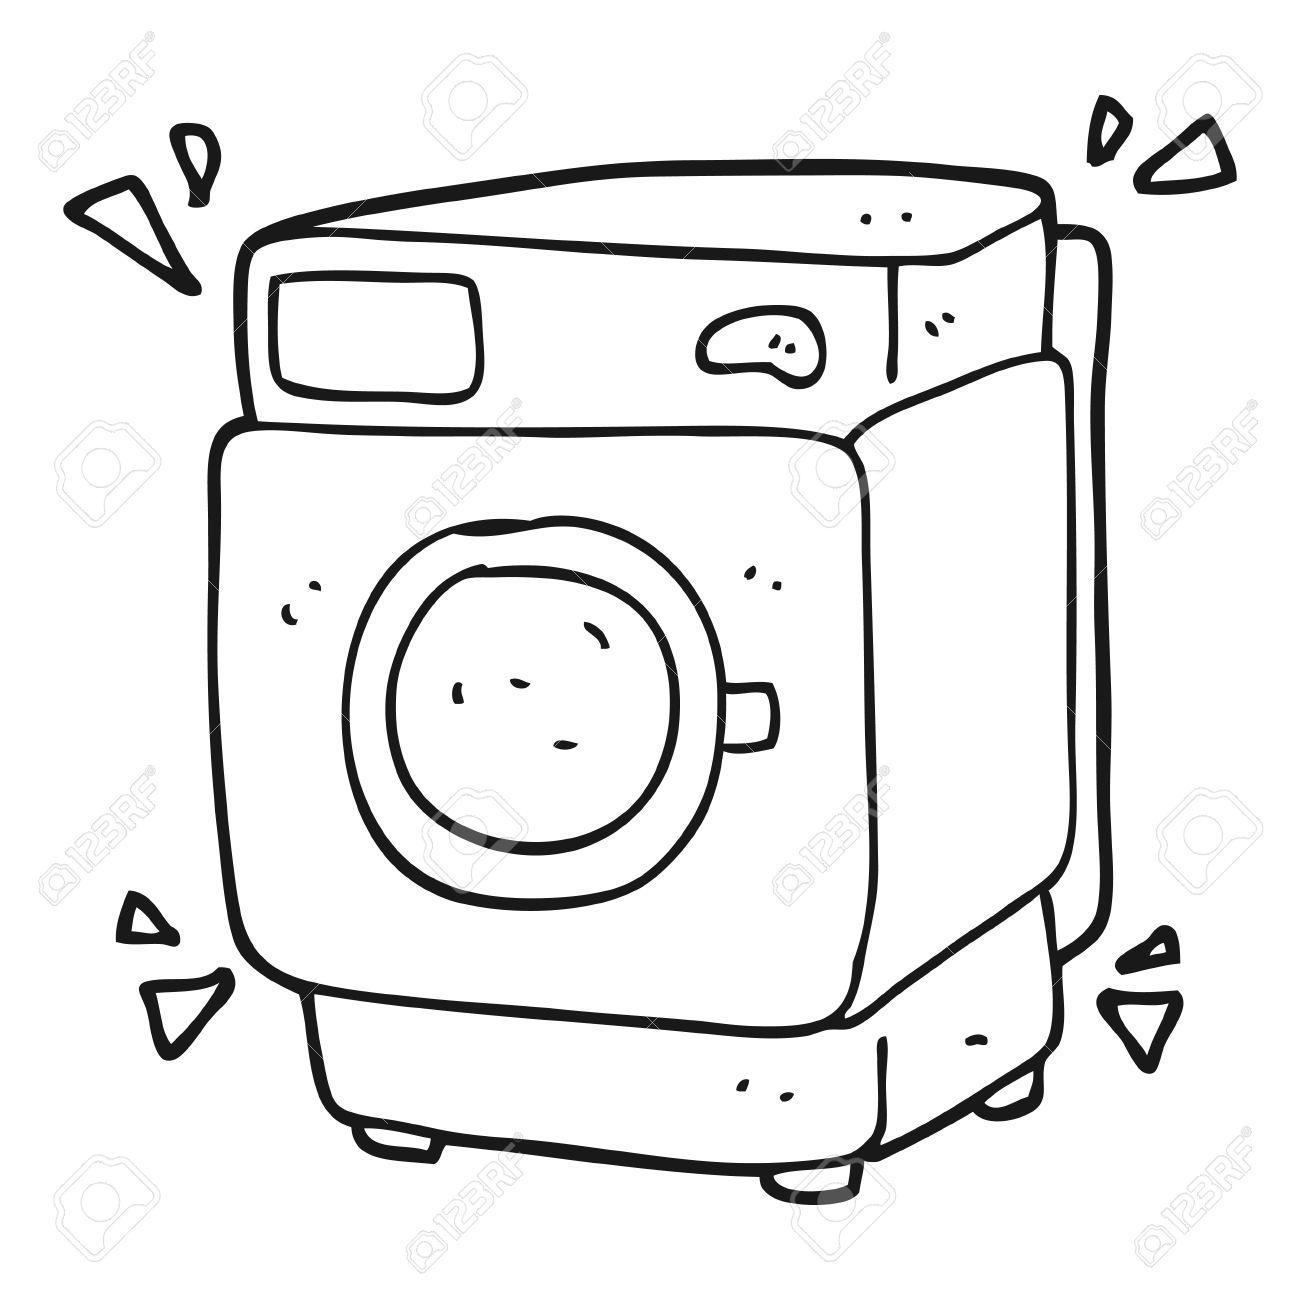 Freehand Drawn Black And White Cartoon Rumbling Washing Machine.